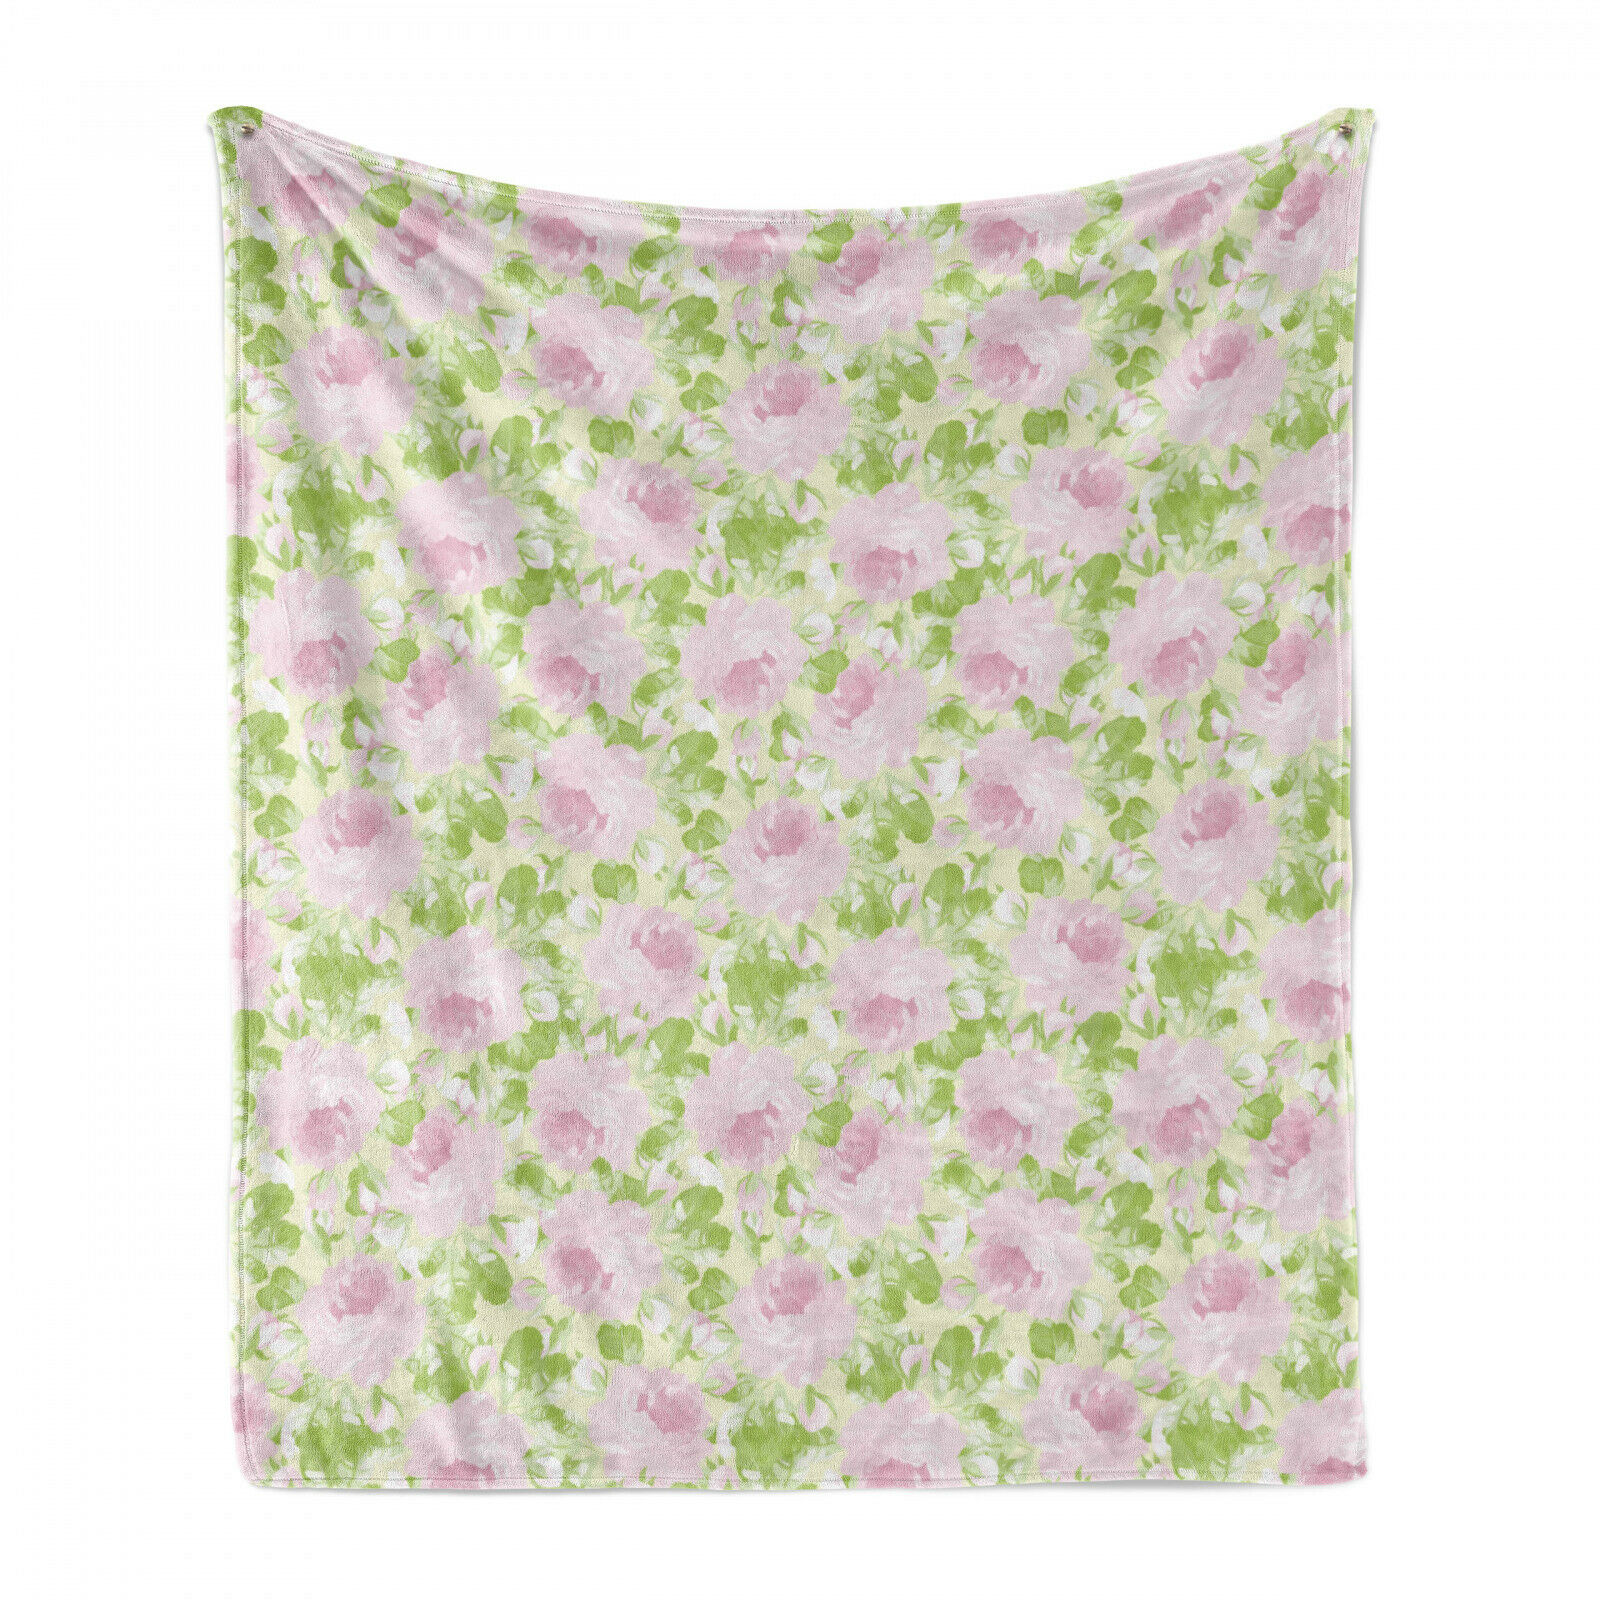 Shabby Flora Weich Flanell Fleece Decke Frühlings-Yard-Pastell